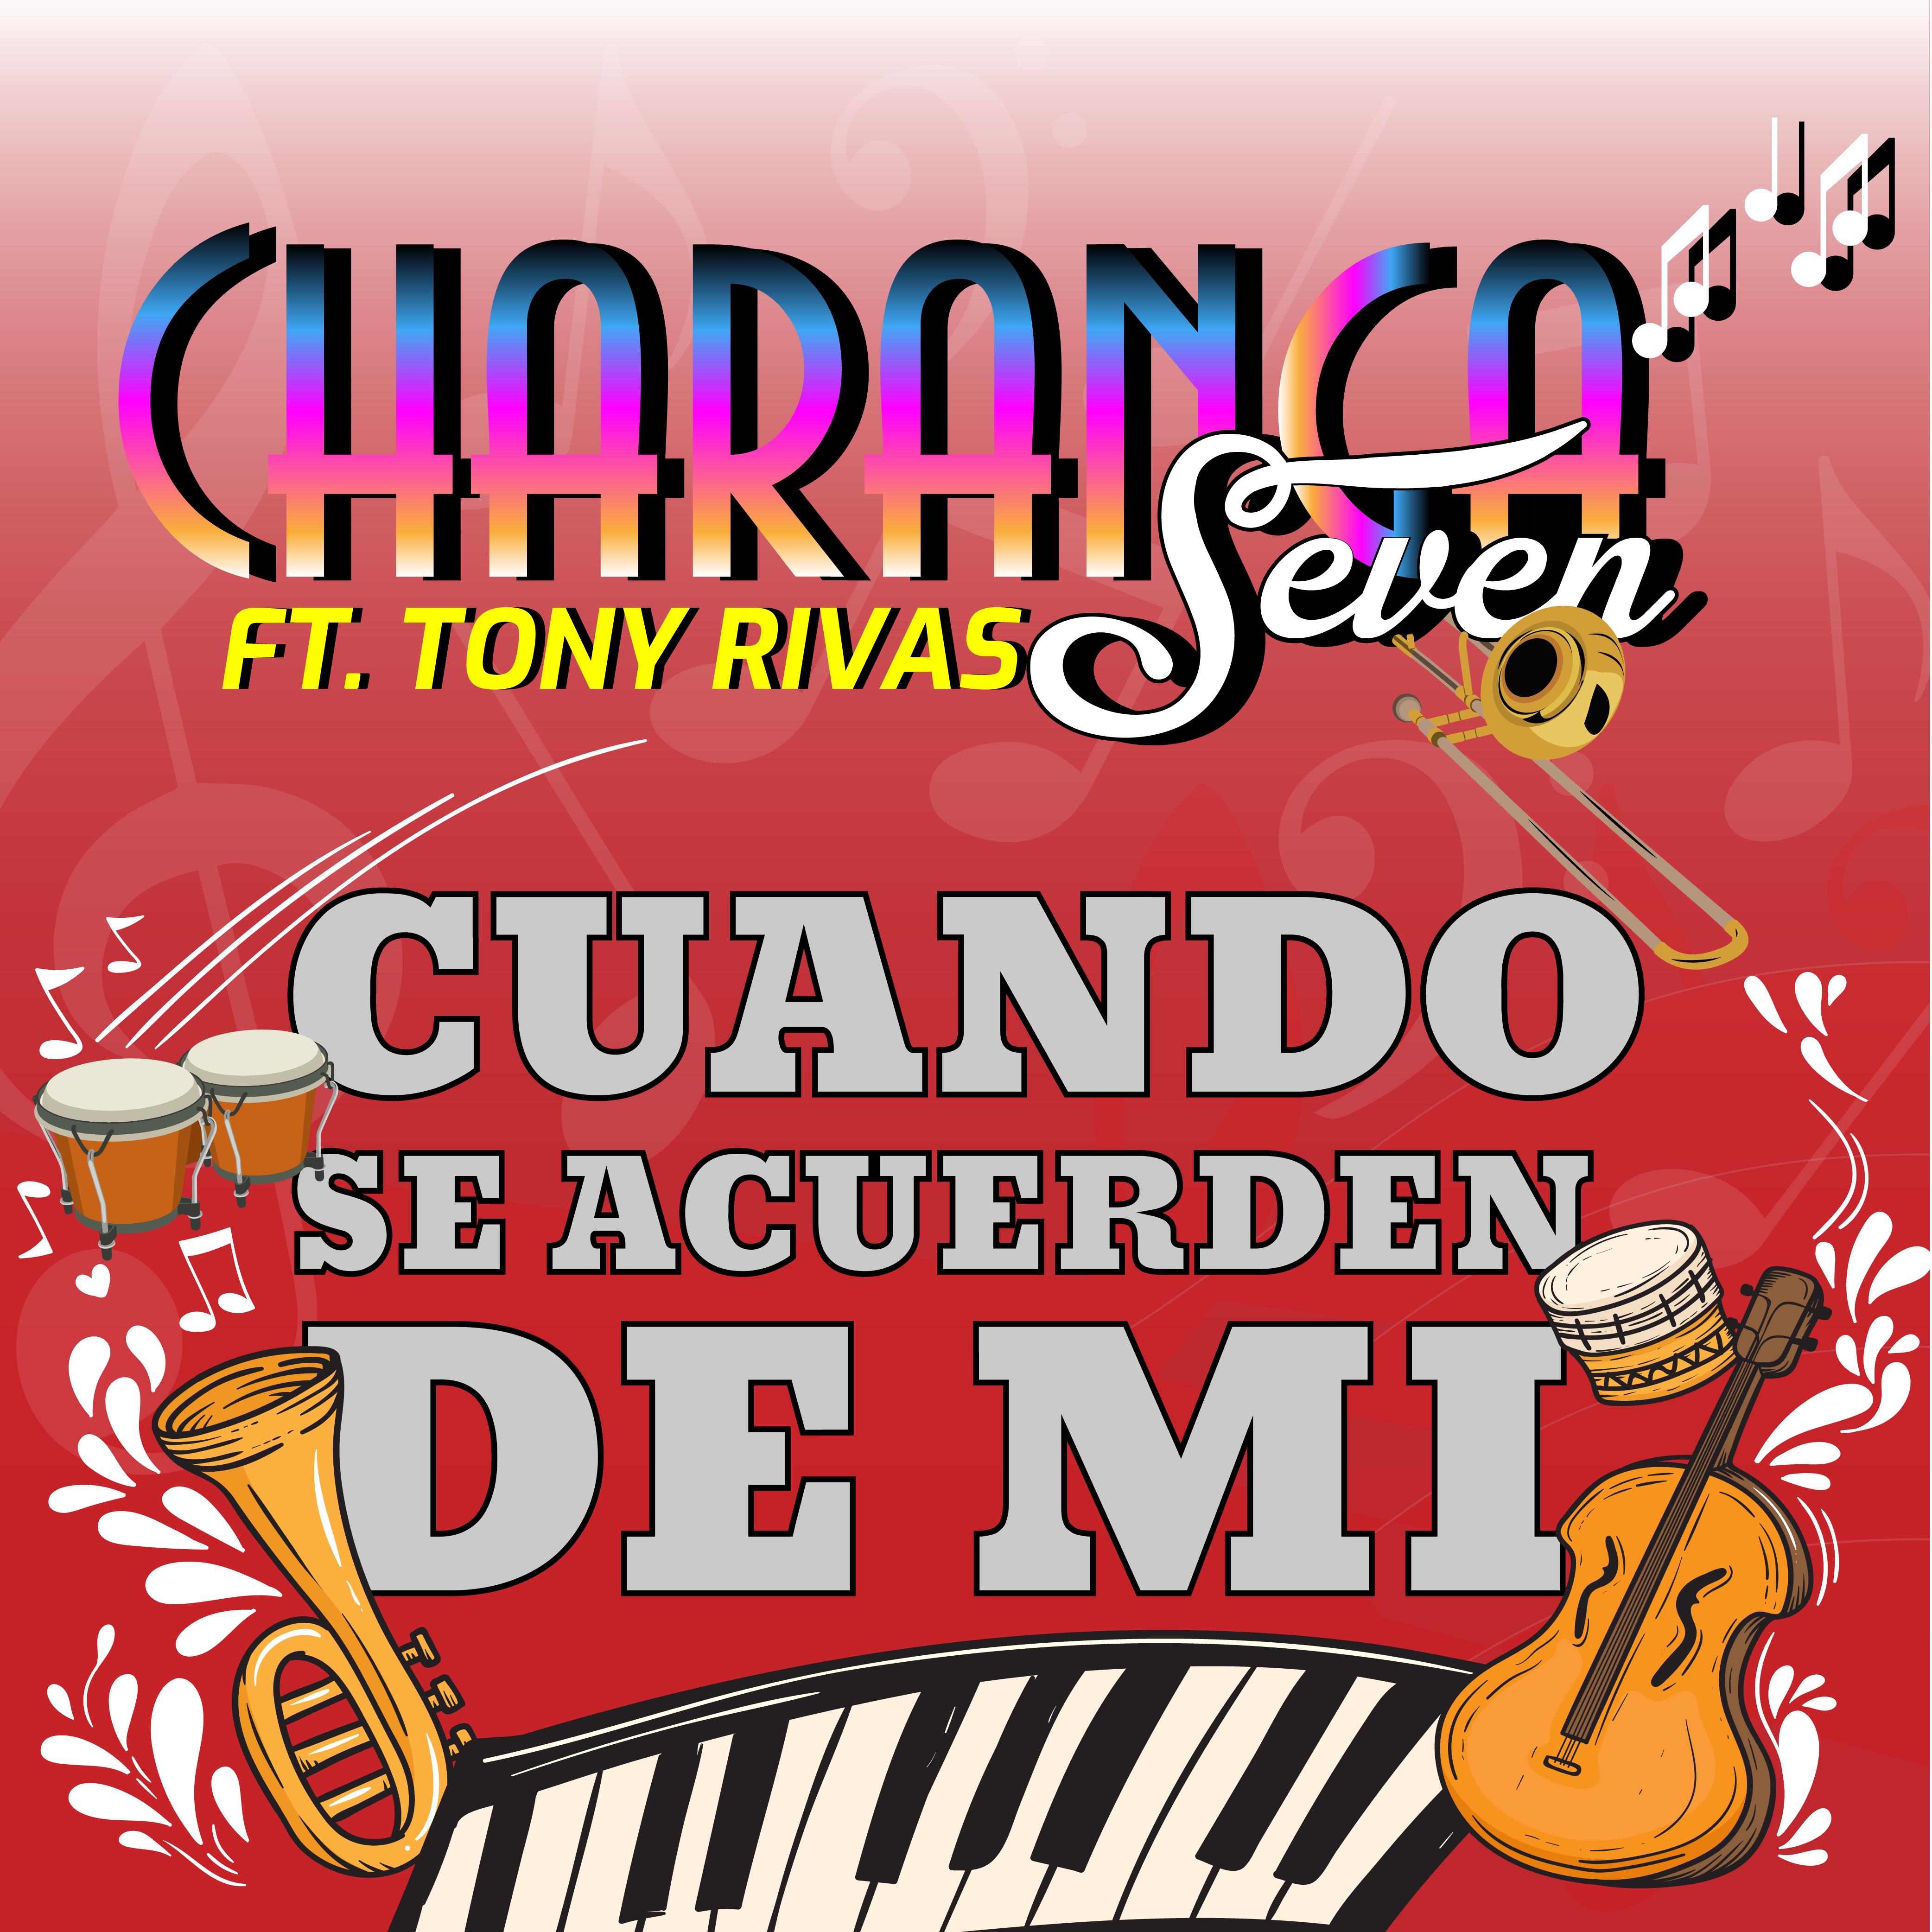 Art for Cuando Se Acuerden de Mi by Charanga Seven Ft. Tony Rivas